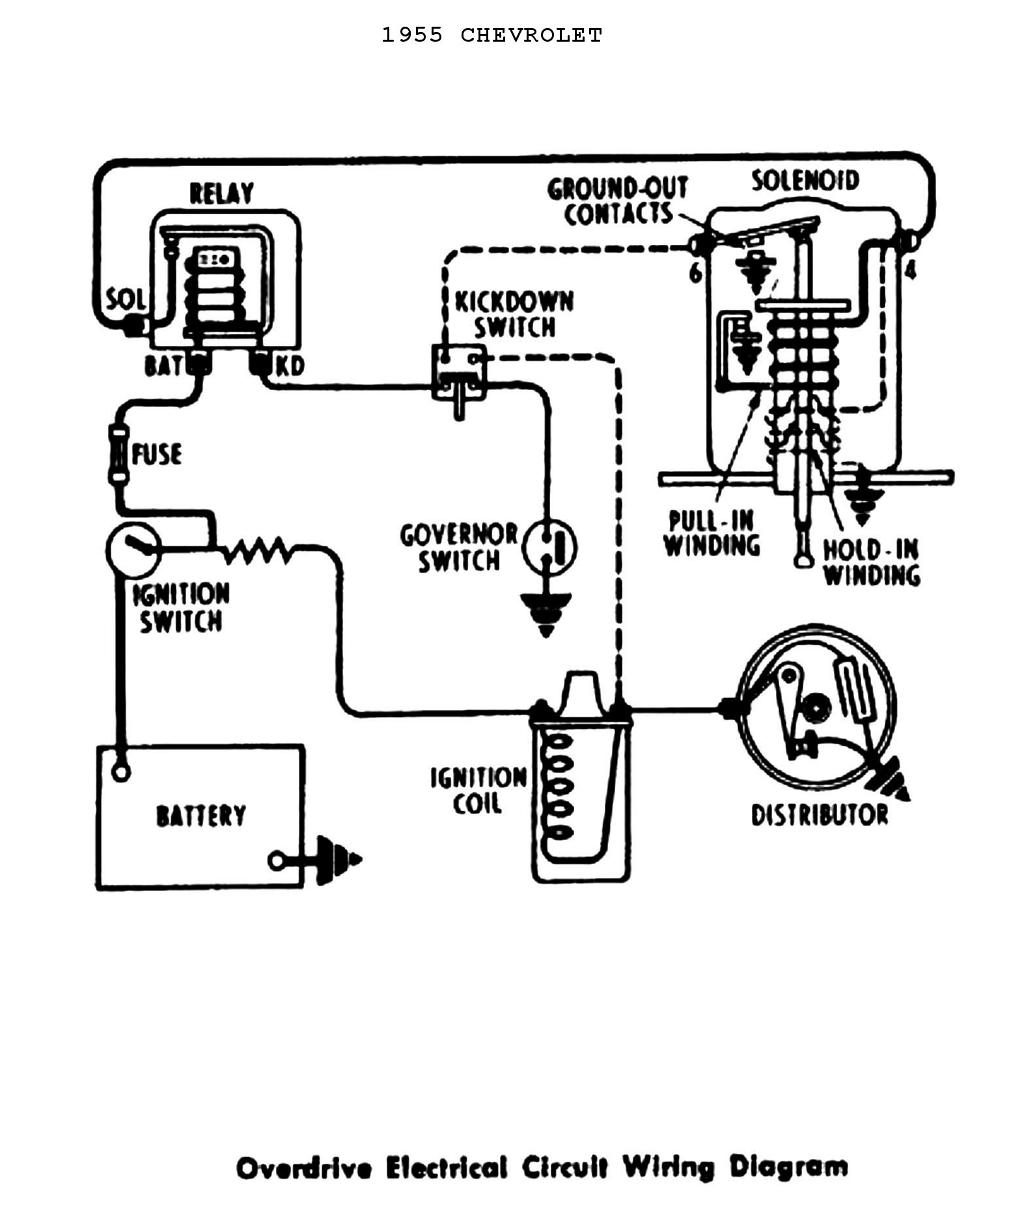 hight resolution of gm hei distributor wiring schematic